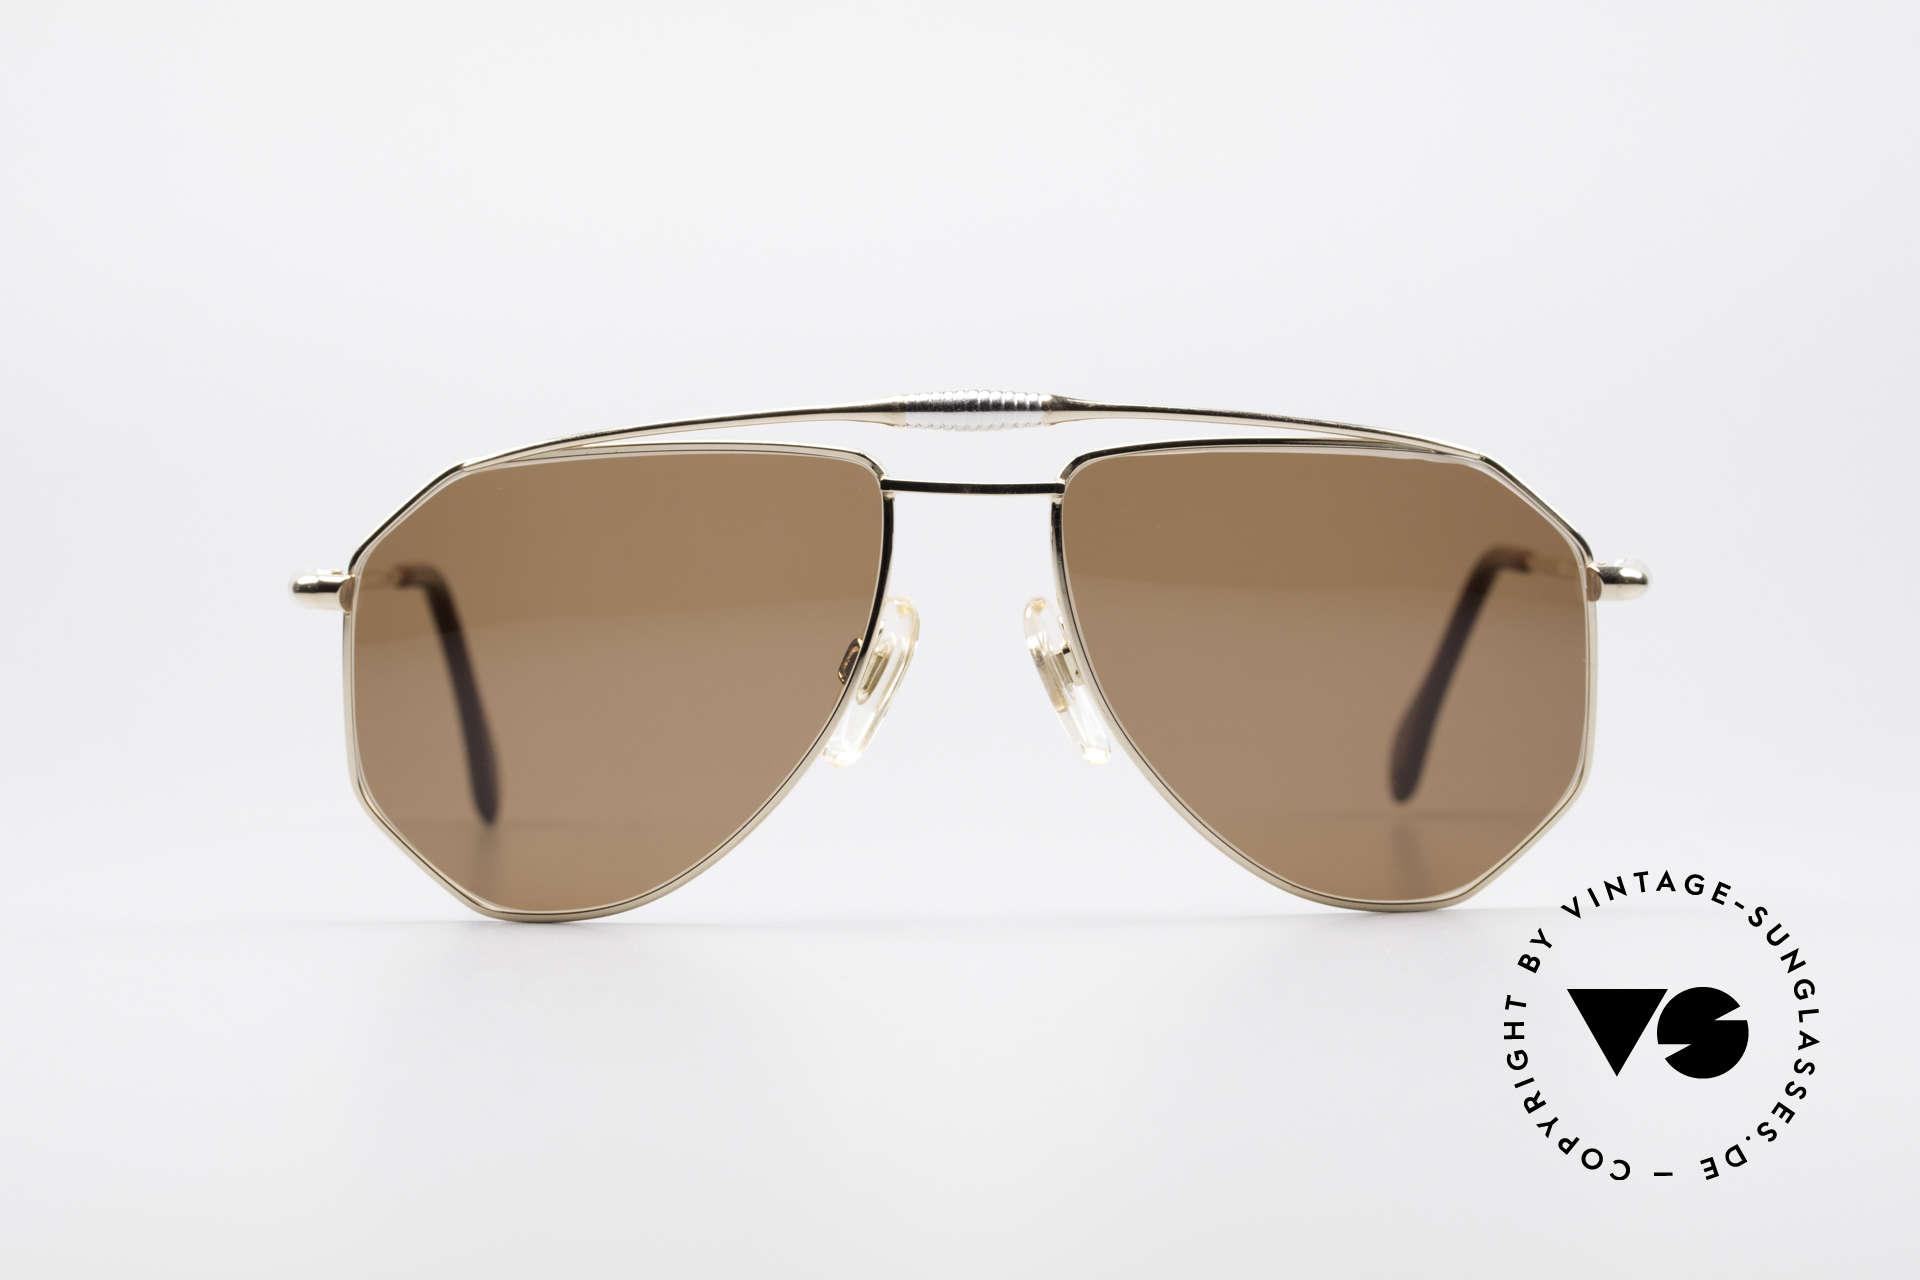 Zollitsch Cadre 120 Medium 80's Sunglasses, distinctive frame for men (outstanding quality, Germany), Made for Men